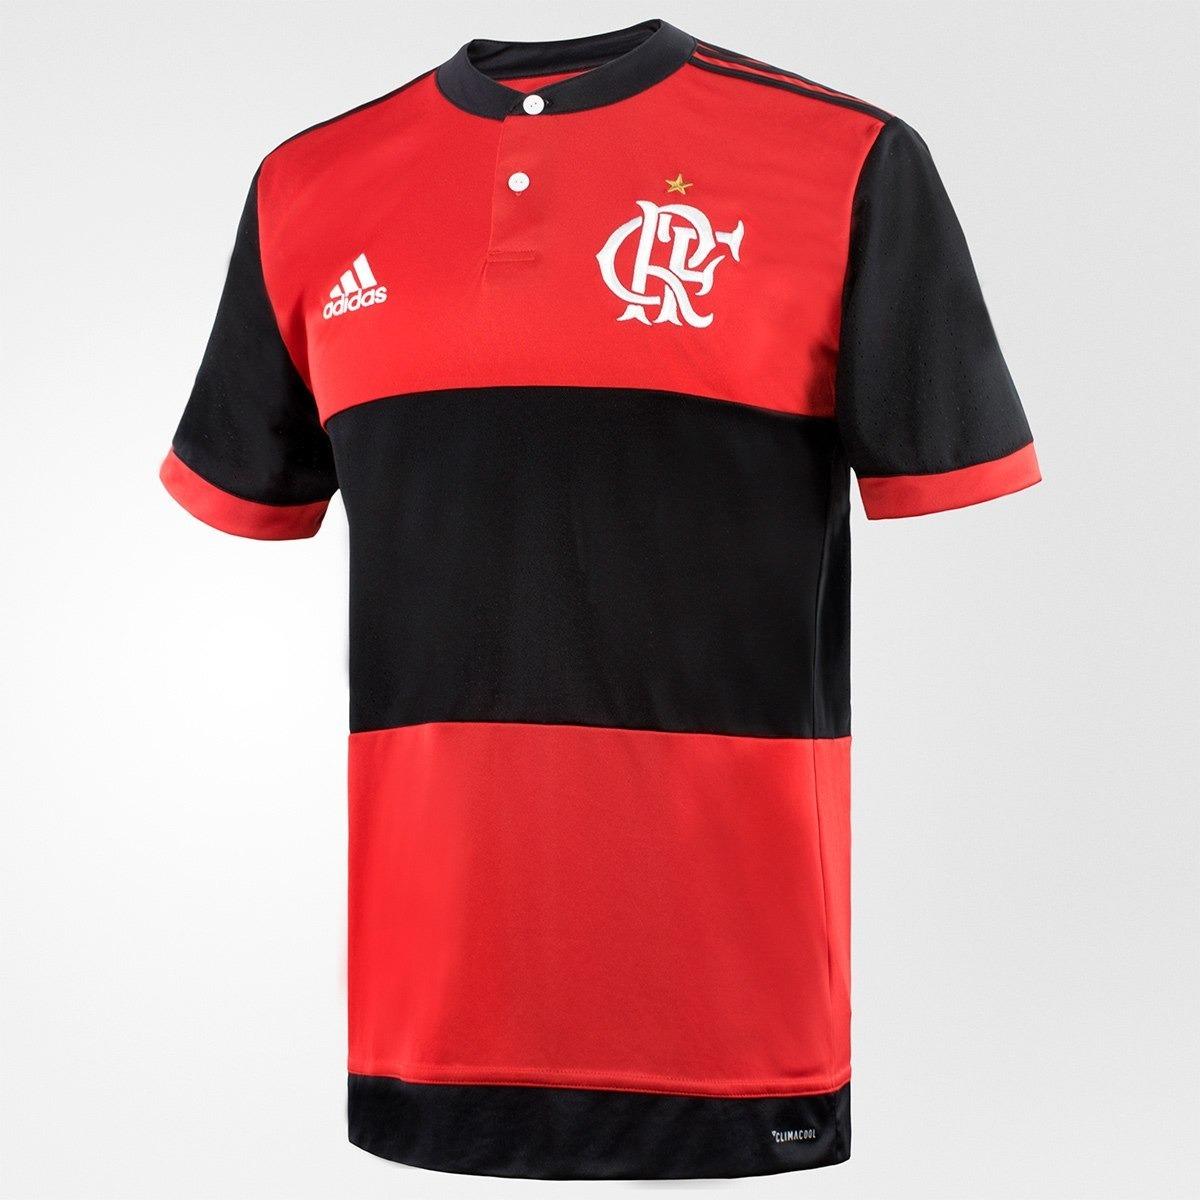 camisa flamengo i 17 18 masculina adidas original jp sports. Carregando zoom . b2709c048fdc5